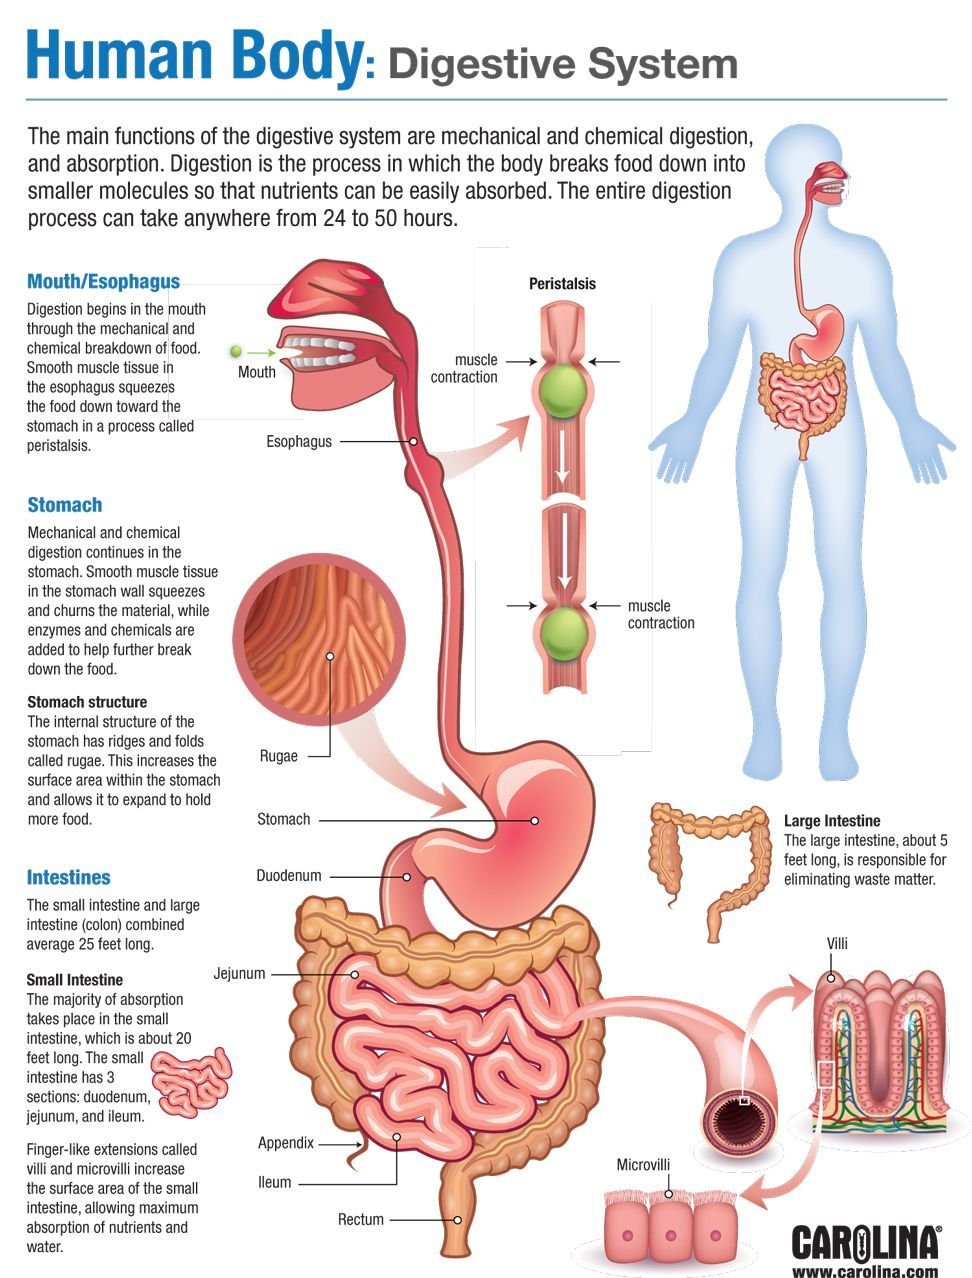 Human Body: Digestive System   Human body anatomy, Human ...